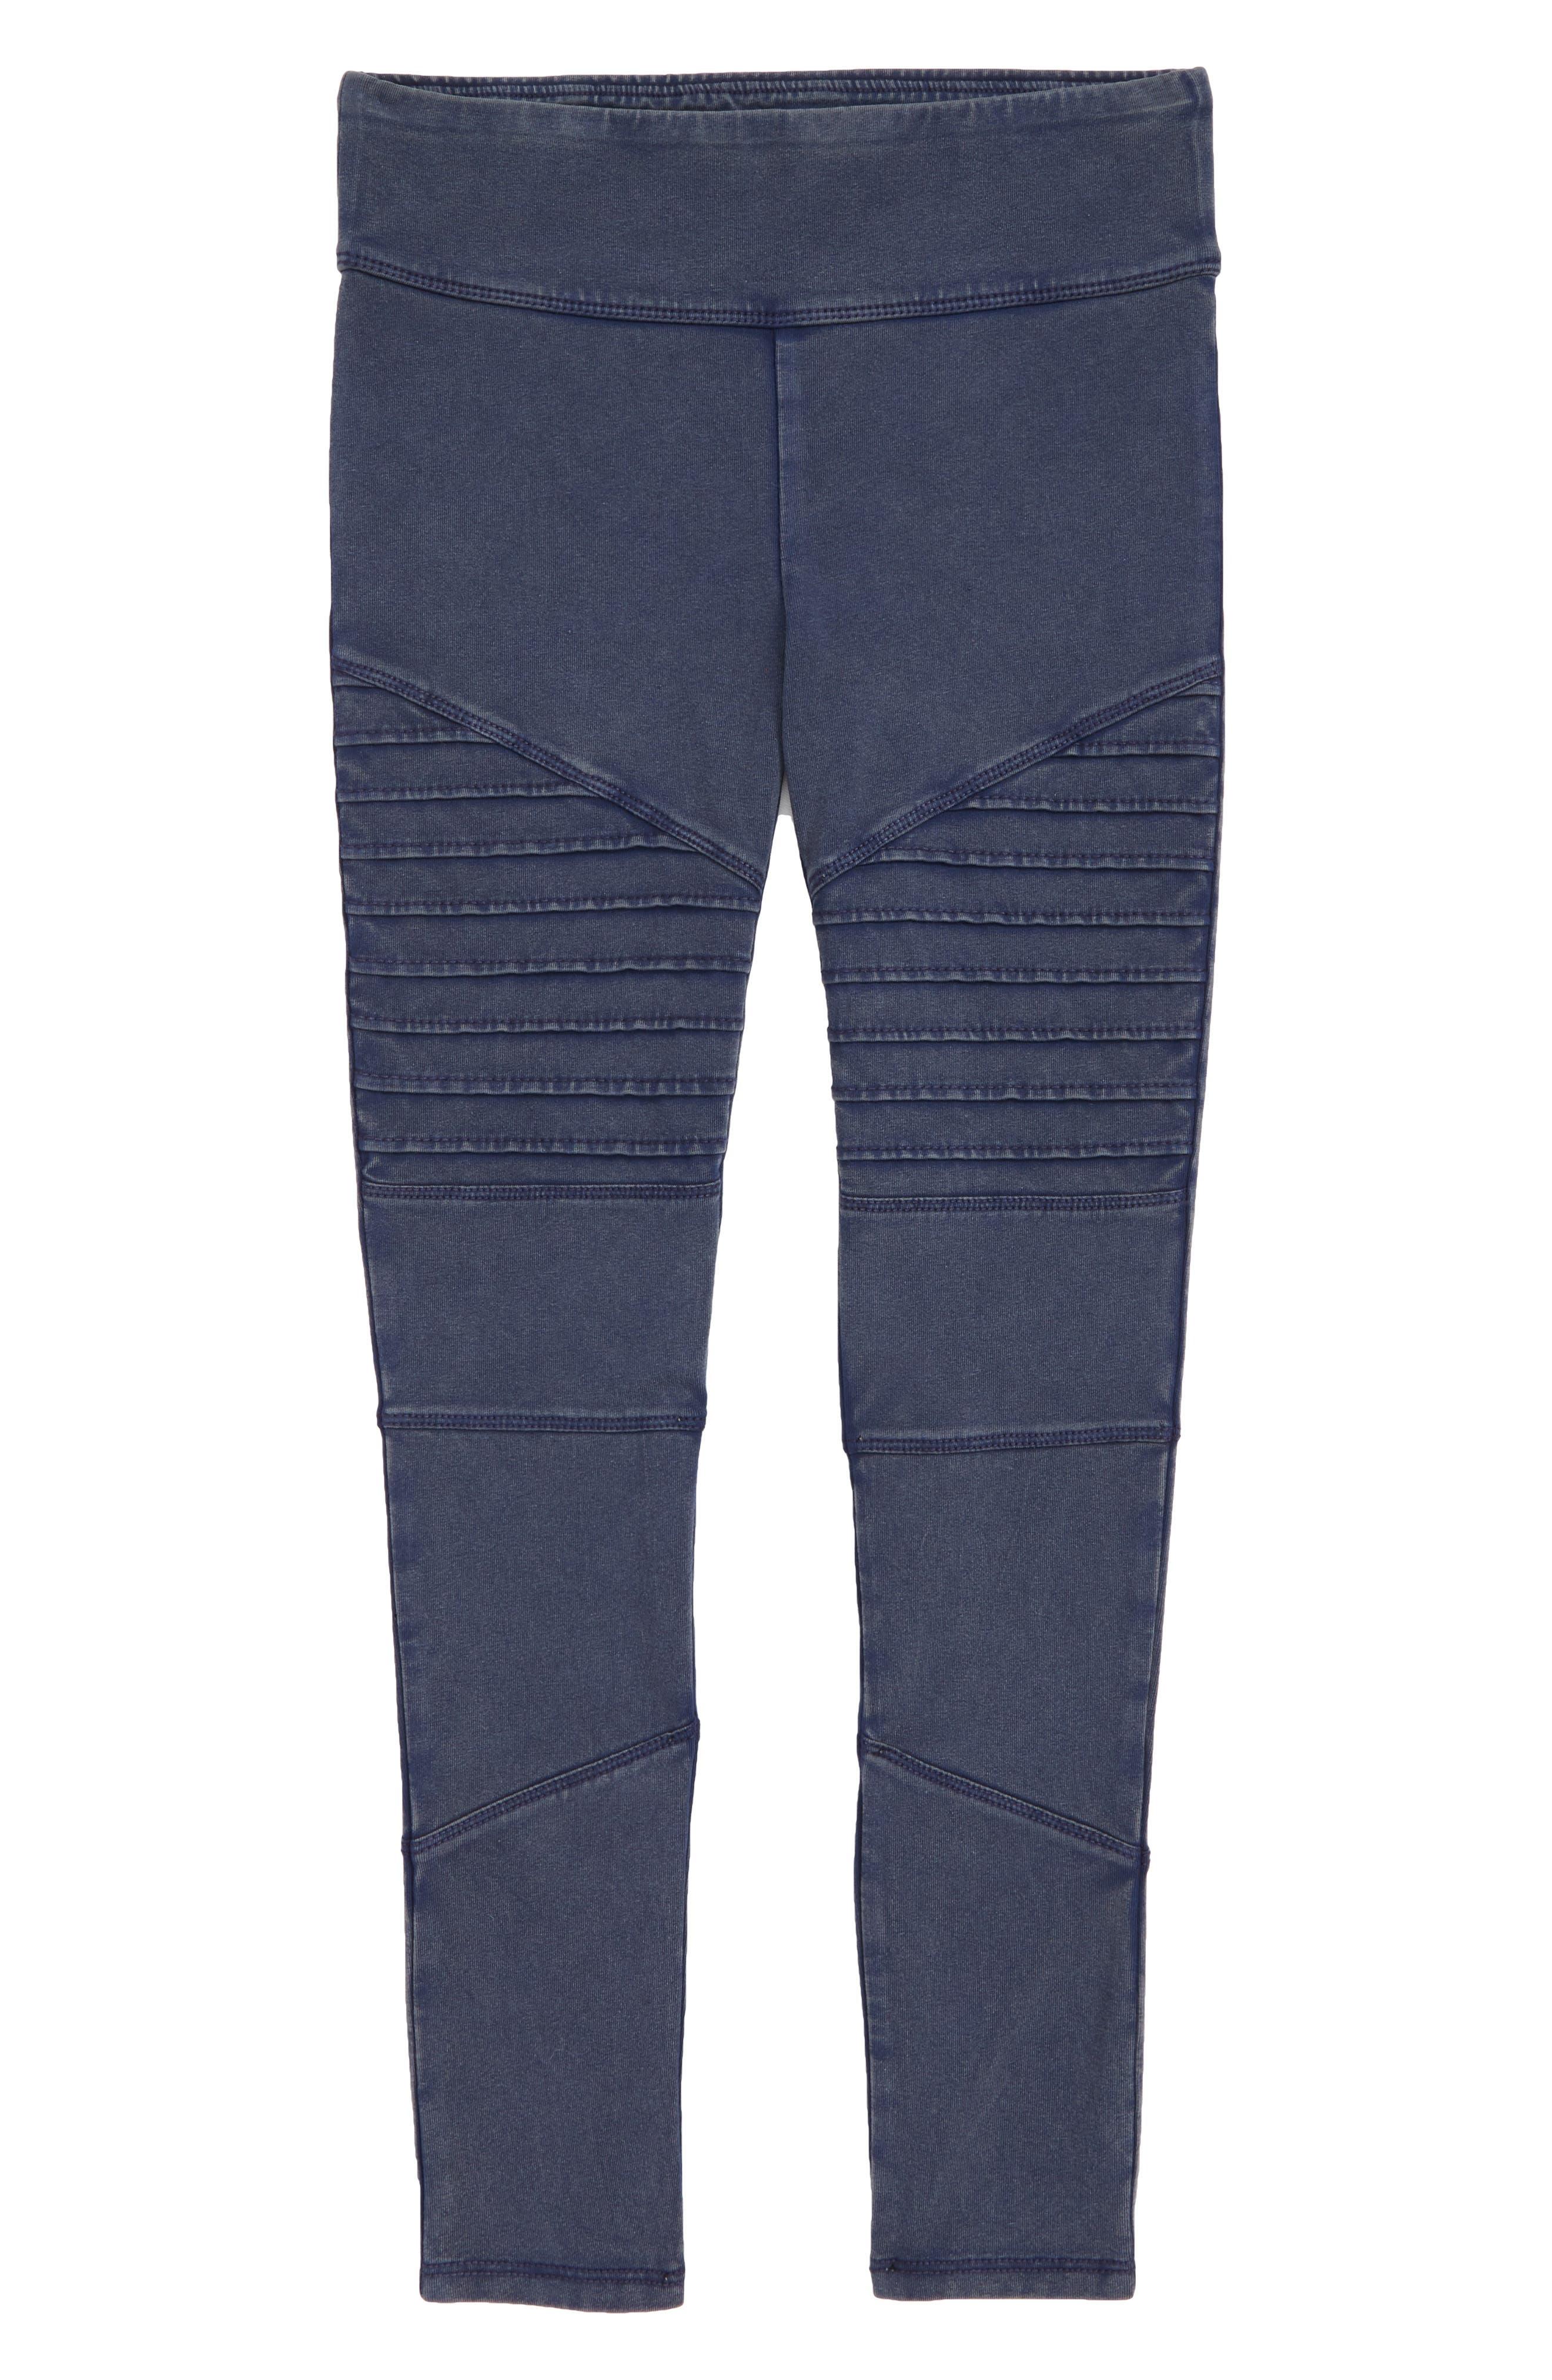 High Waist Moto Pants,                         Main,                         color, NAVY PEACOAT WASH